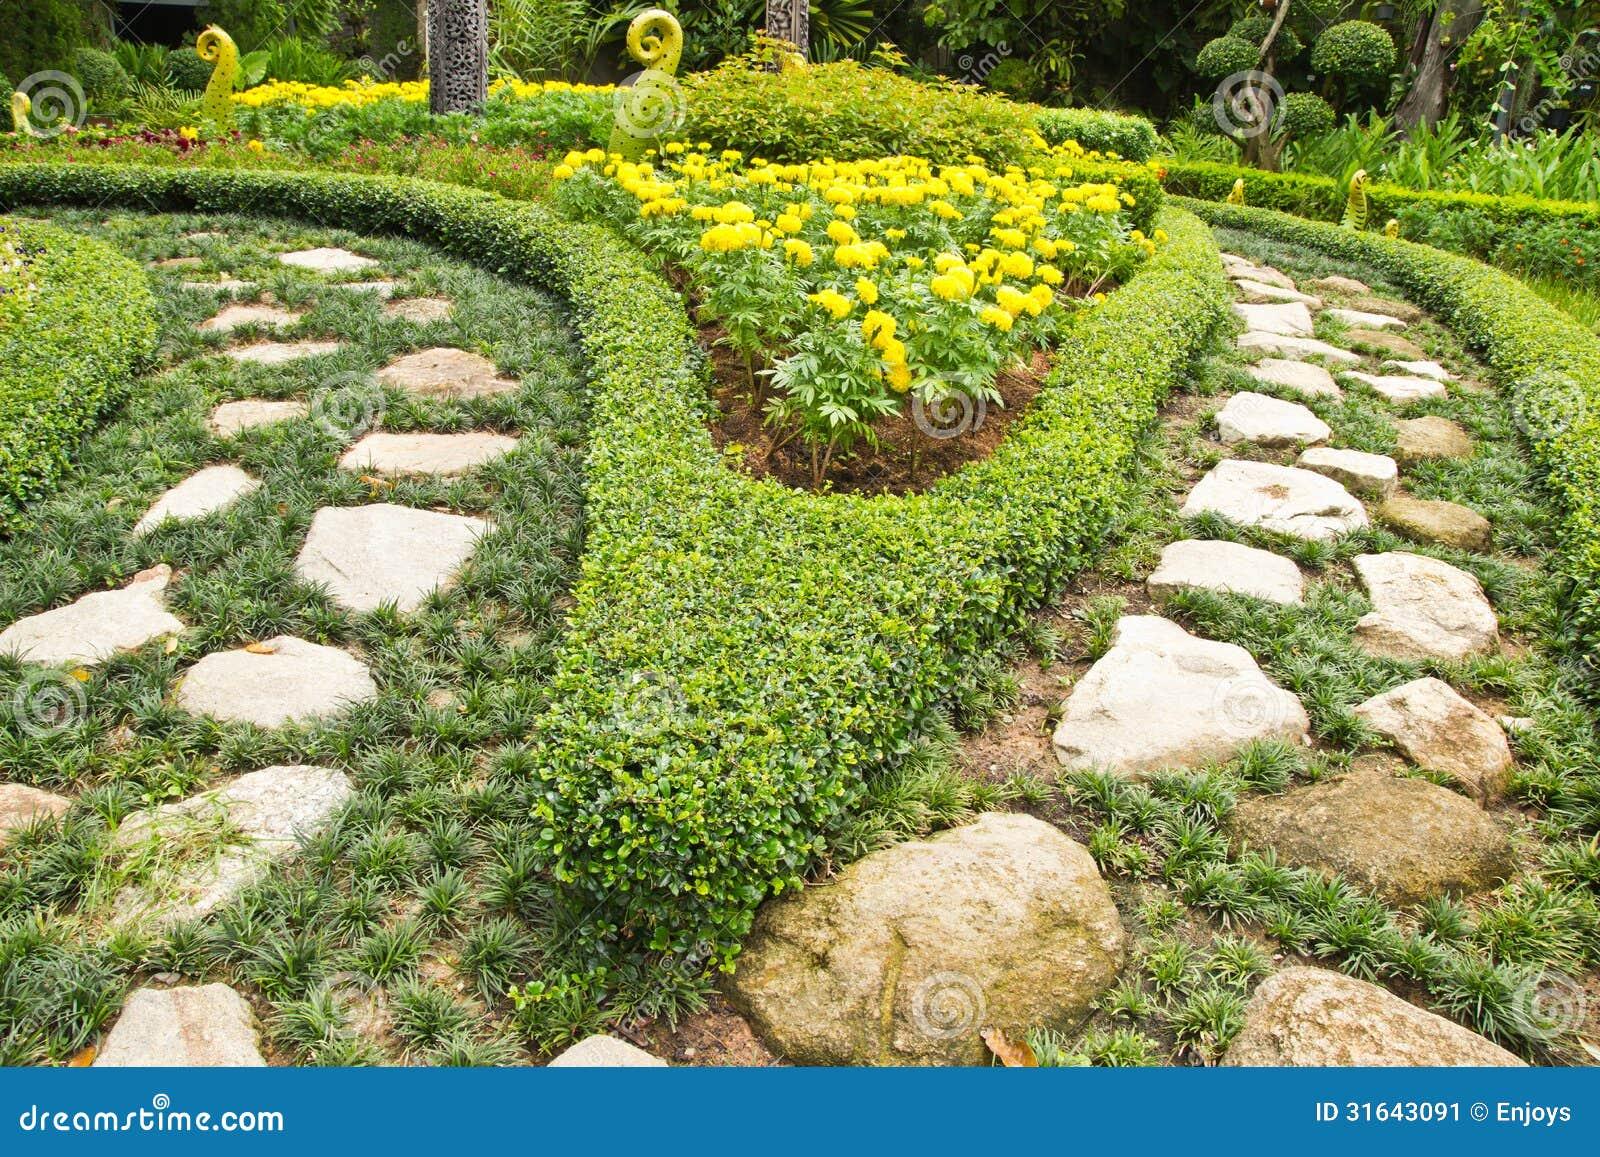 Topiary garden design art stock image image 31643091 for Topiary garden designs